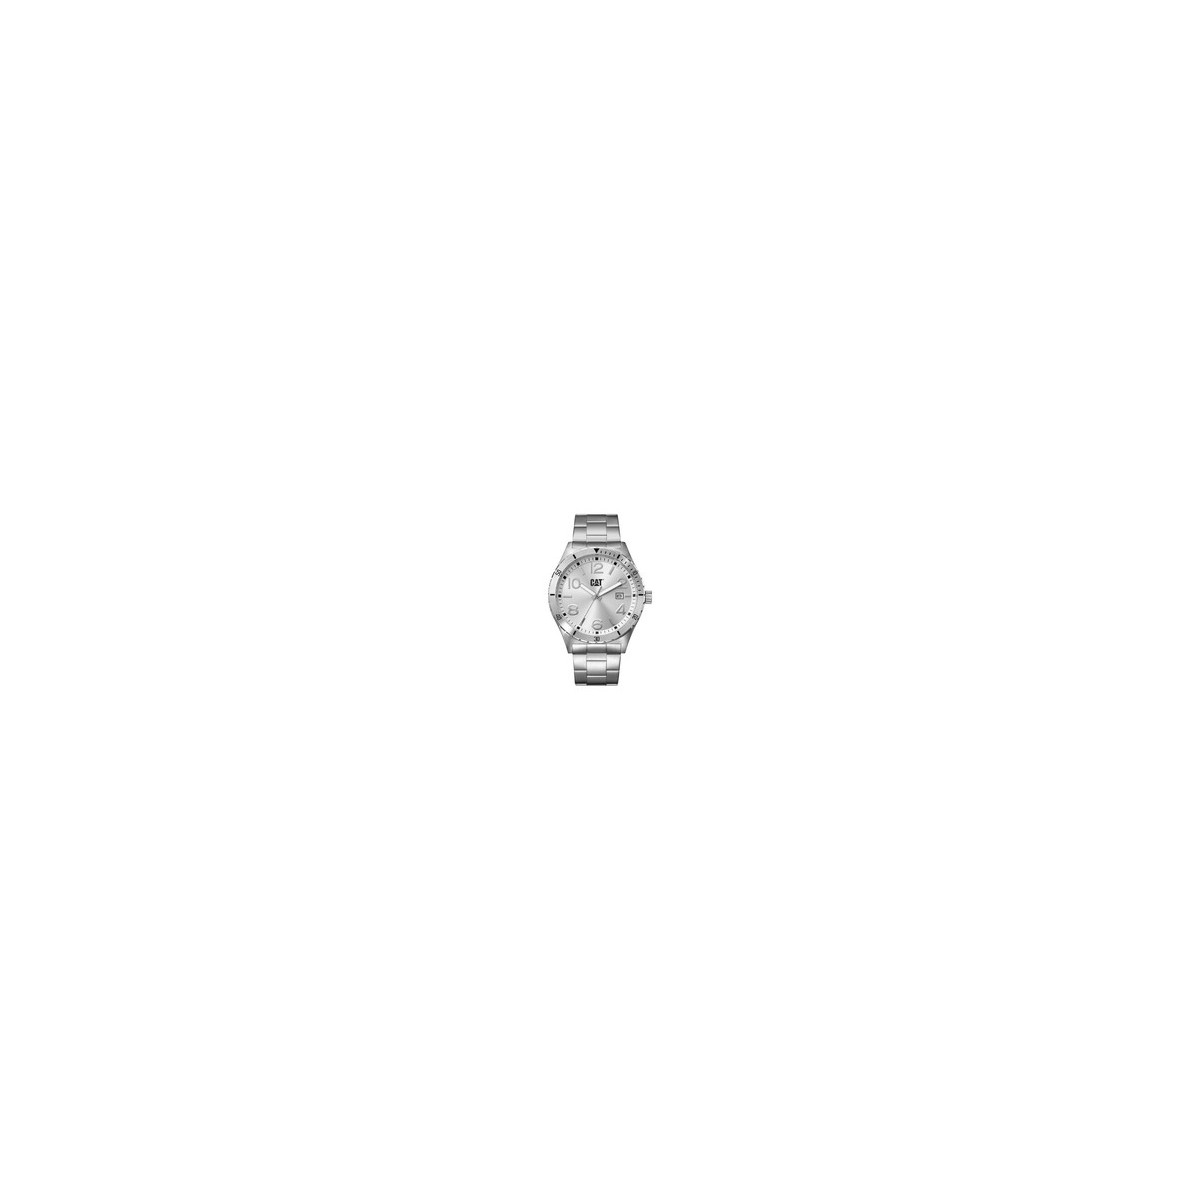 https://www.gaberjoyeria.com/3413-thickbox_default/reloj-caterpillar-ni24111233.jpg